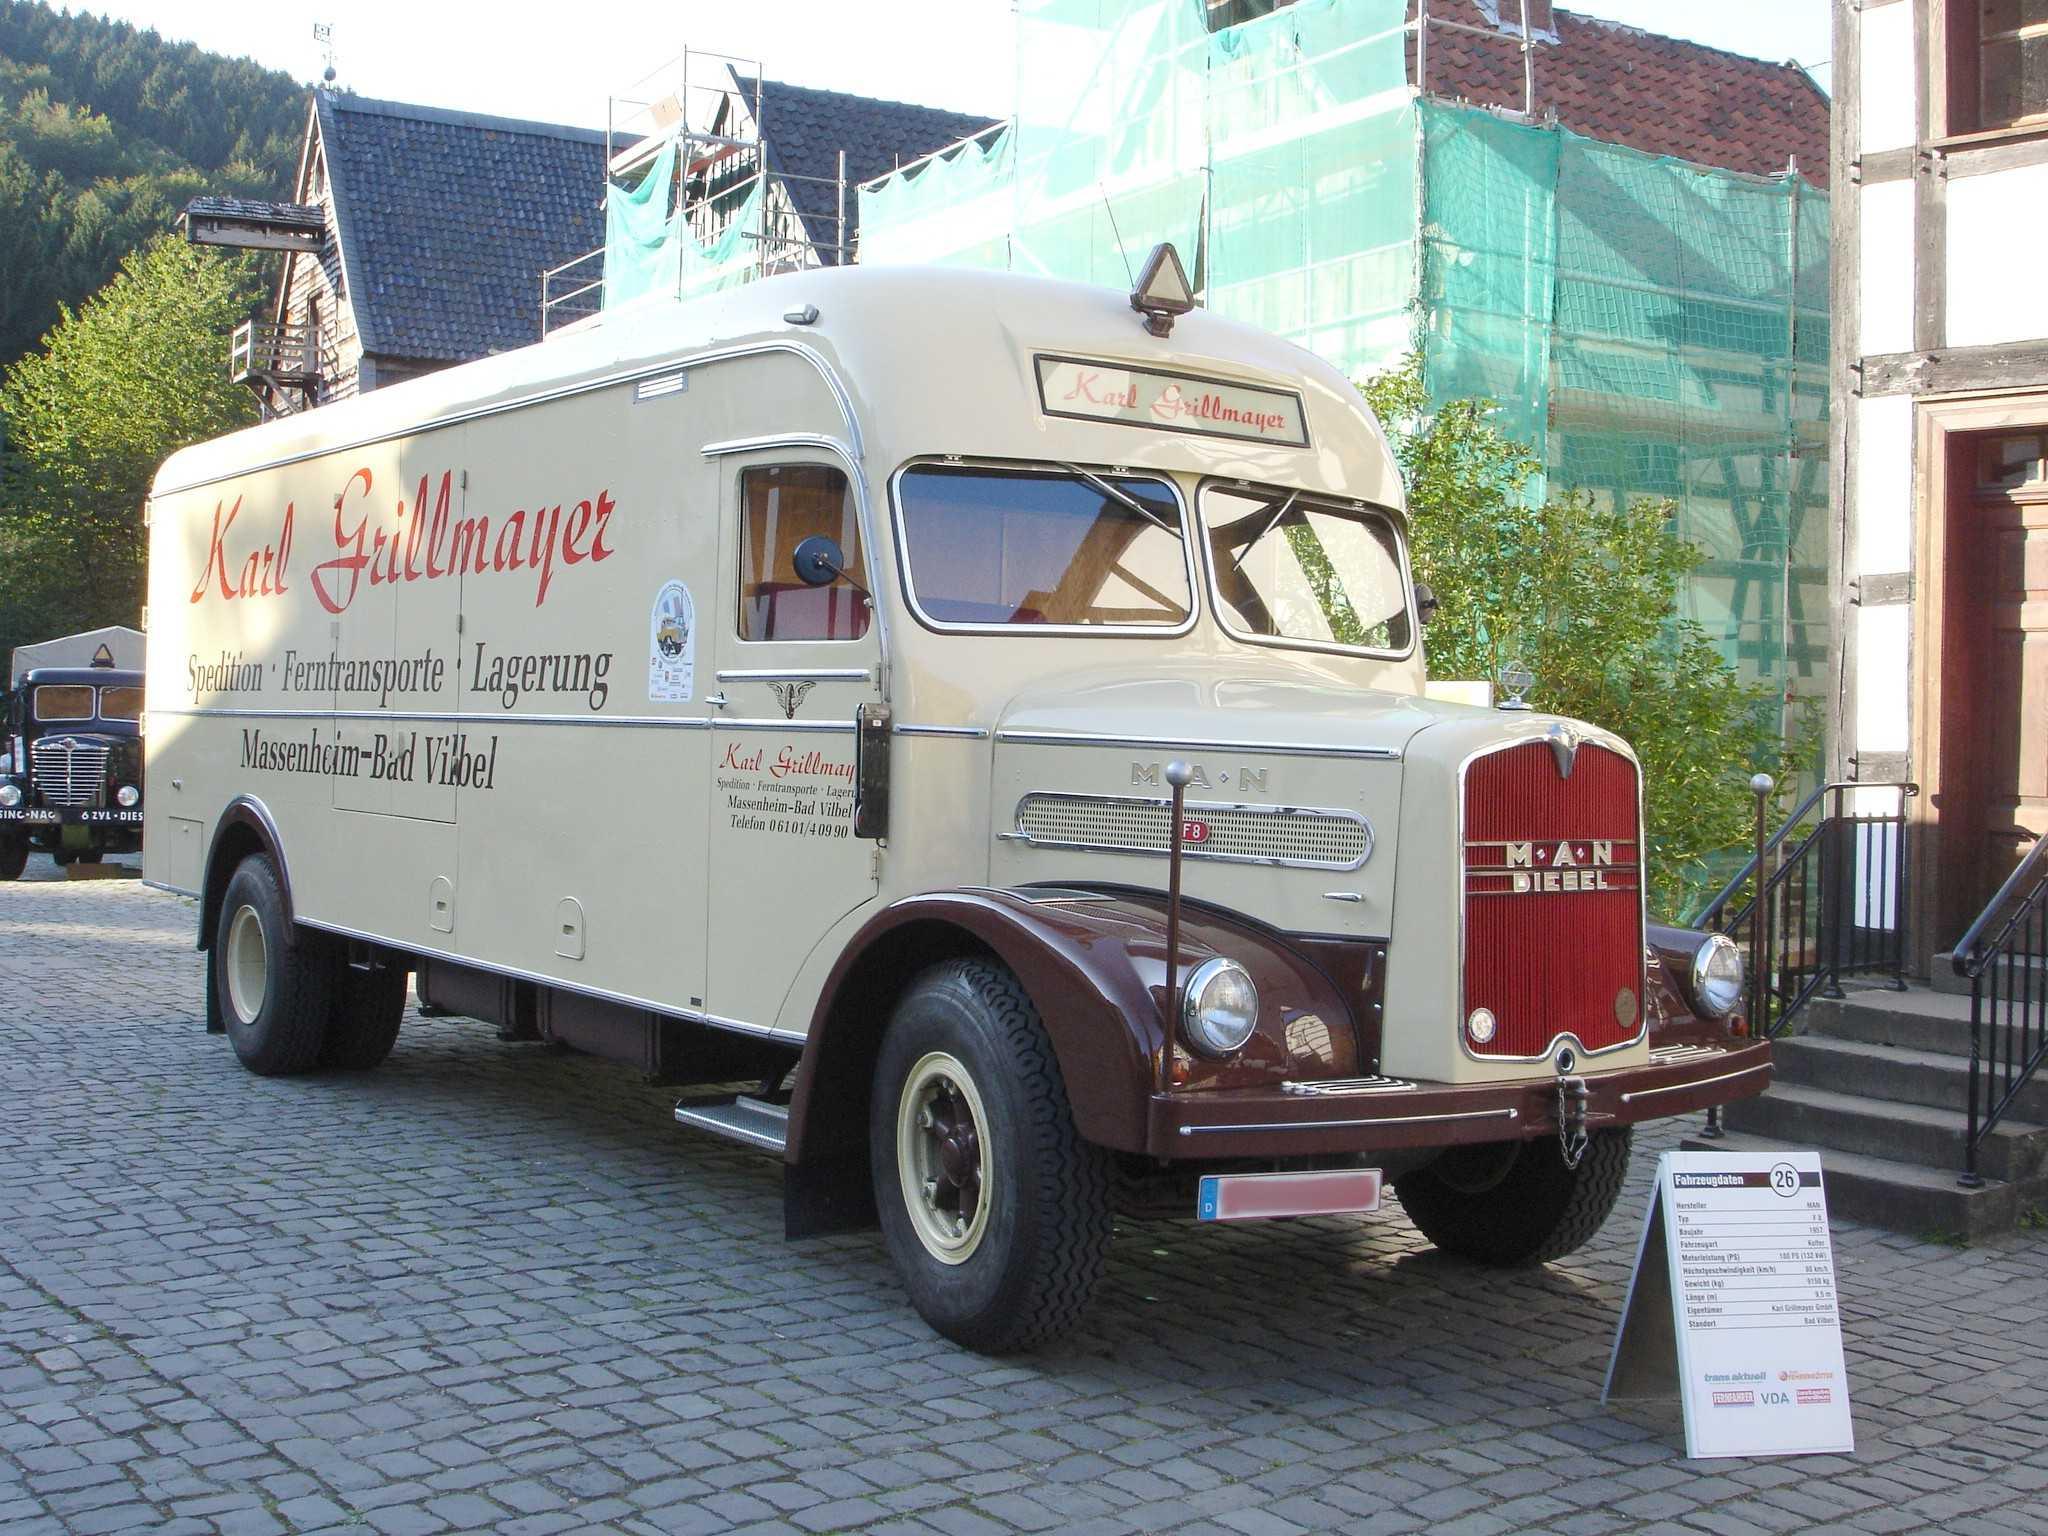 1967 1968 Us Fahrzeuge Pkw Usa Neu! Reparaturanleitung Einstelldaten 1966